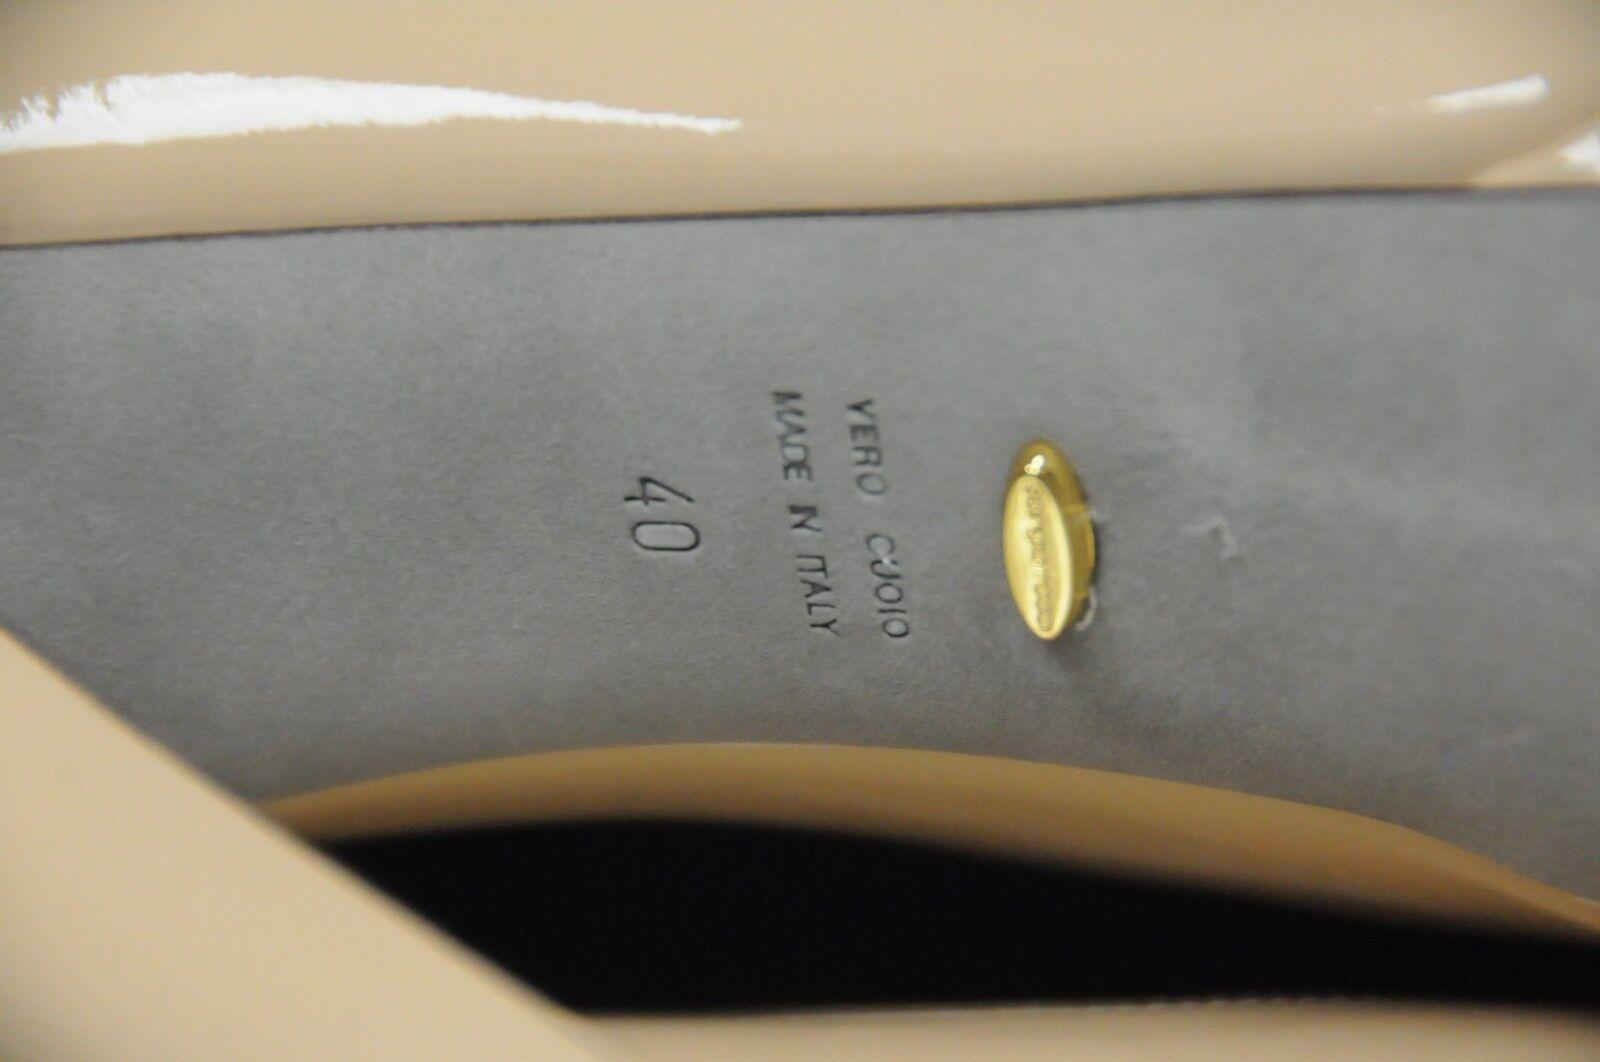 Neuf Sergio Rossi Milady Chair Beige Plateforme Plateforme Plateforme Cuir Chaussures Plates 40 a74563